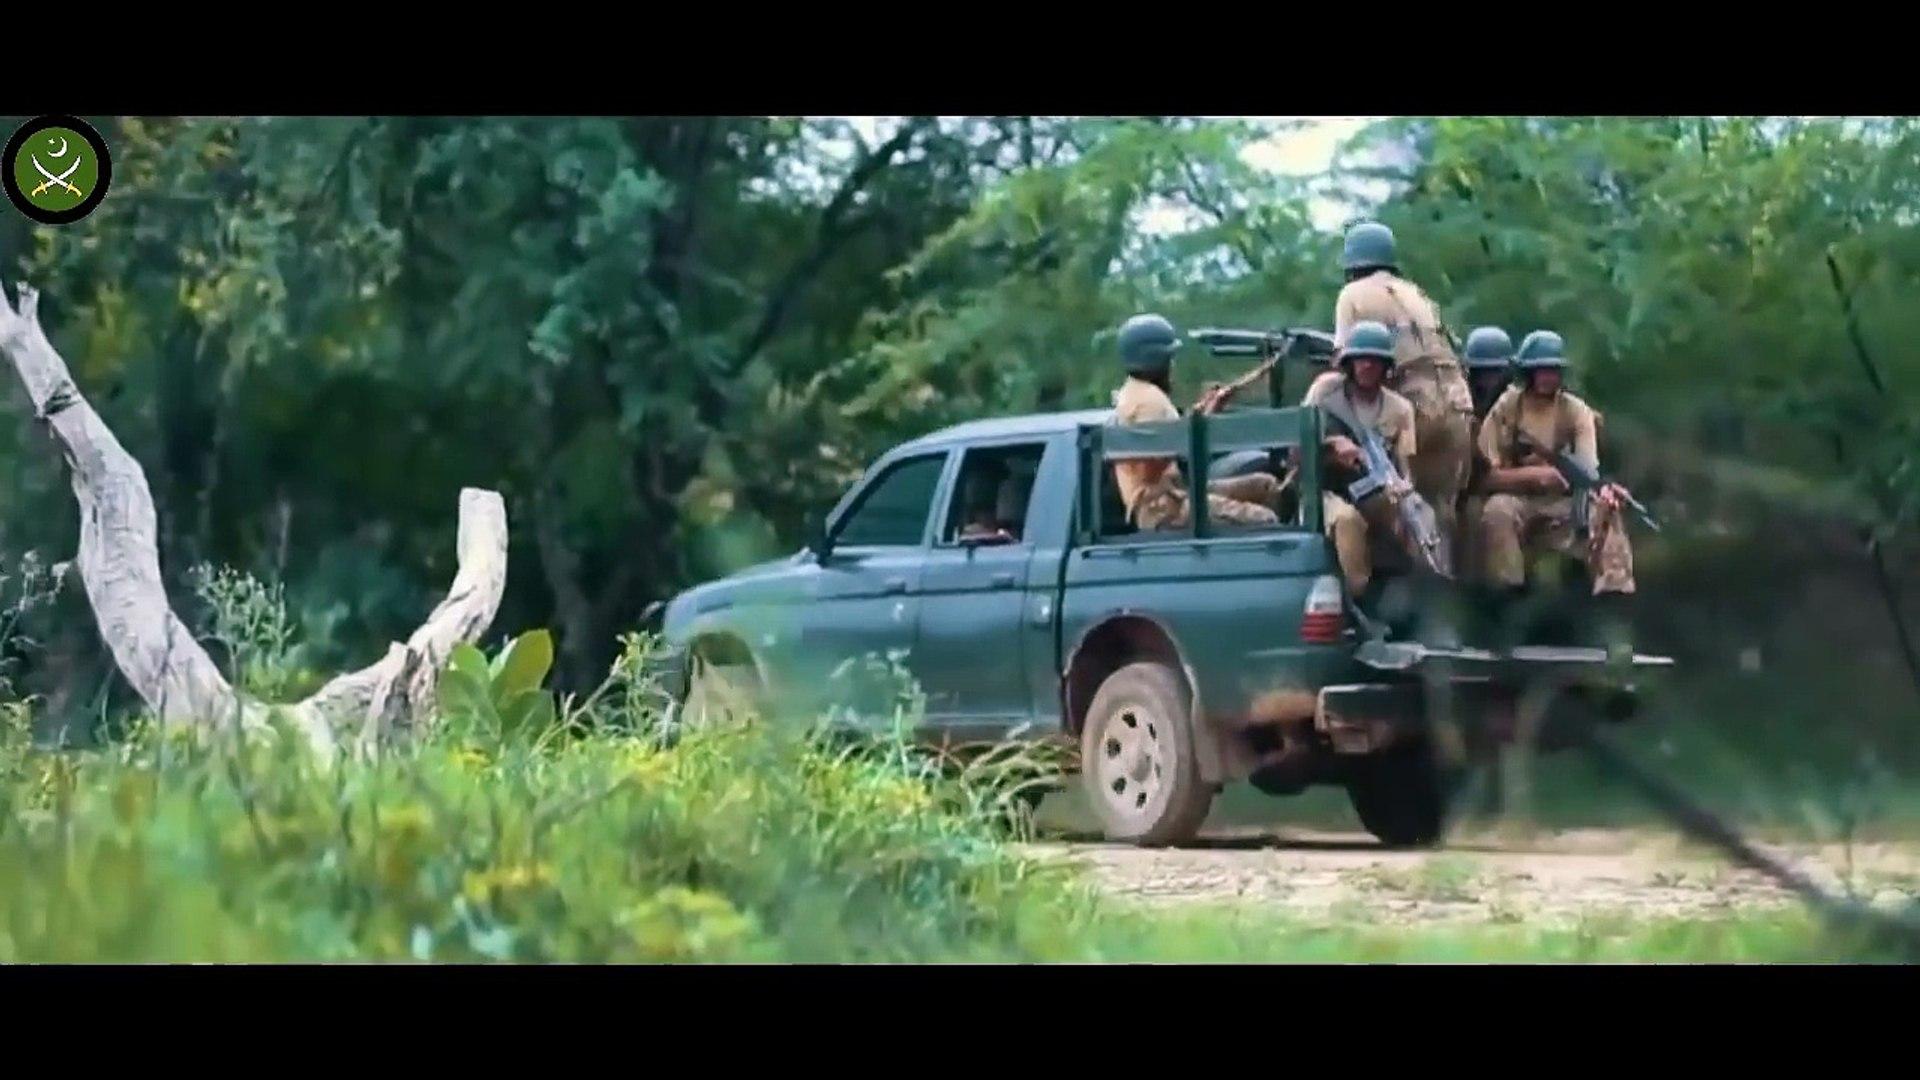 Nara-e-Takbeer Allah O Akbar - Pakistan Army Song 2016 Full HD